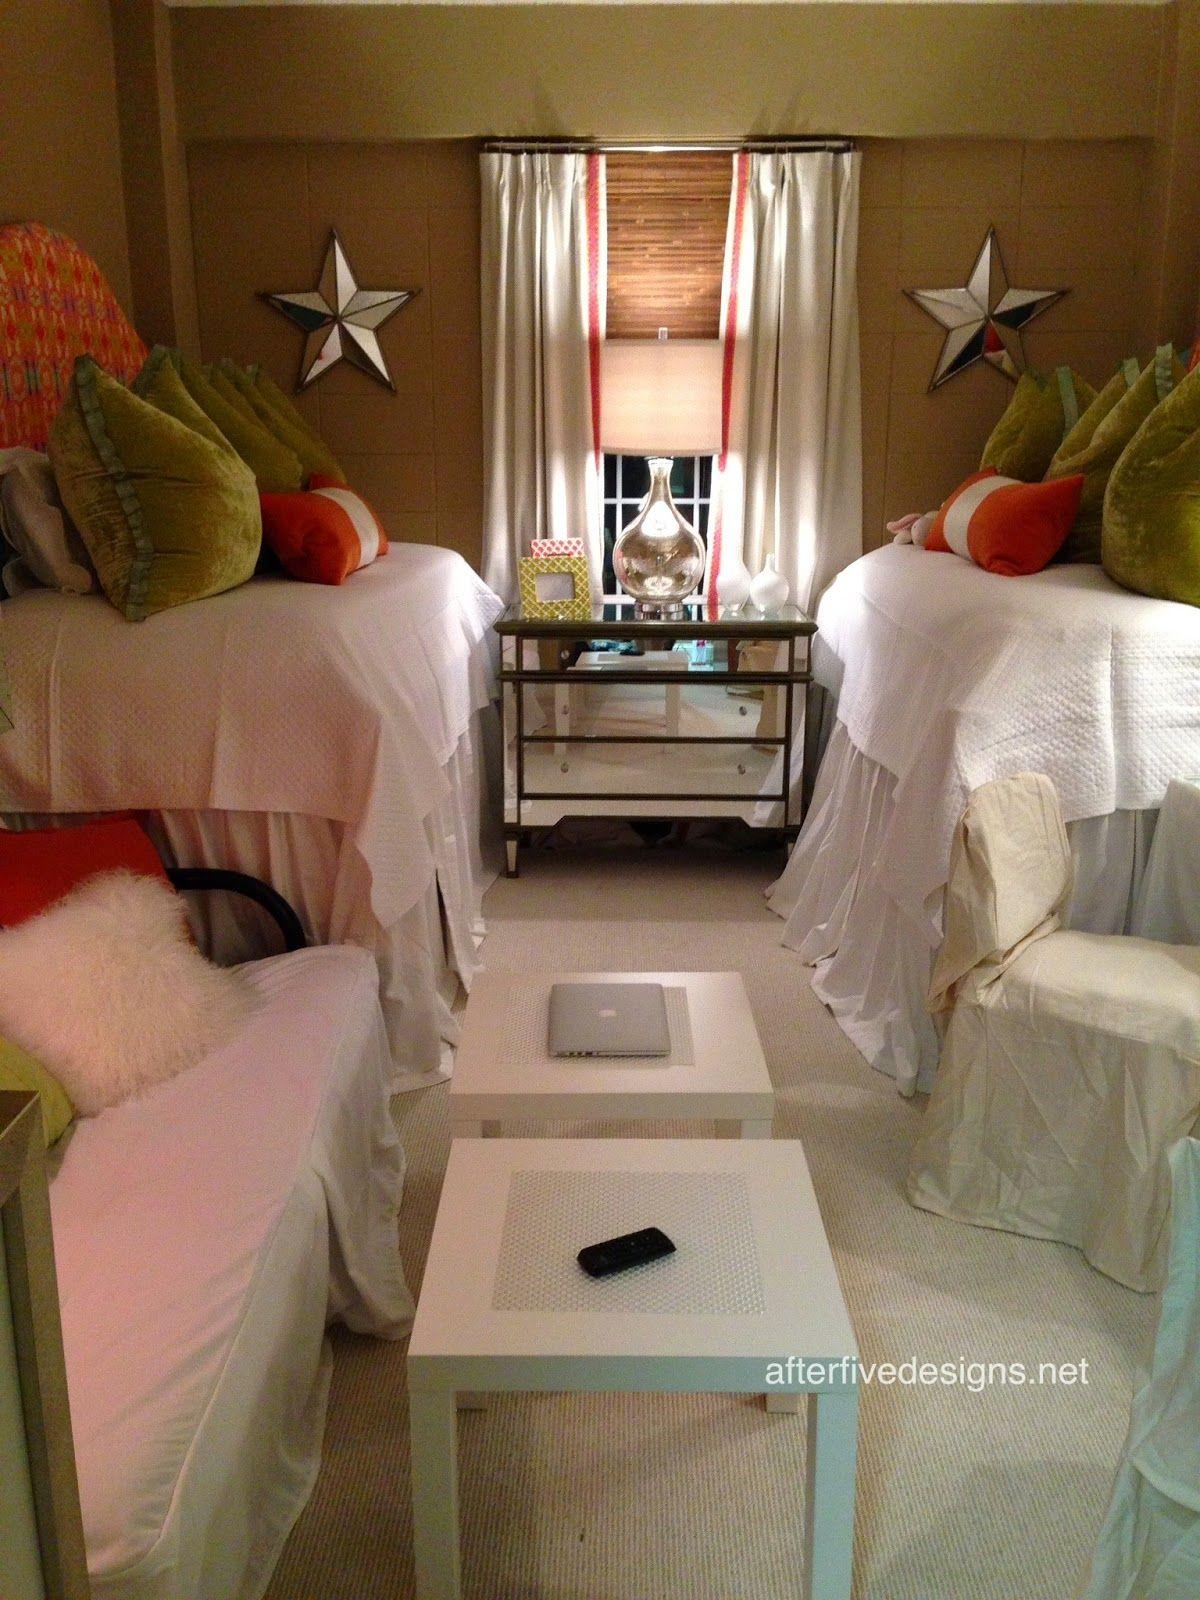 Dorm Rooms 2014 Ole Miss Martin Dorm Room 1 Ole Miss Dorm Rooms Stylish Dorm Room Dorm Sweet Dorm